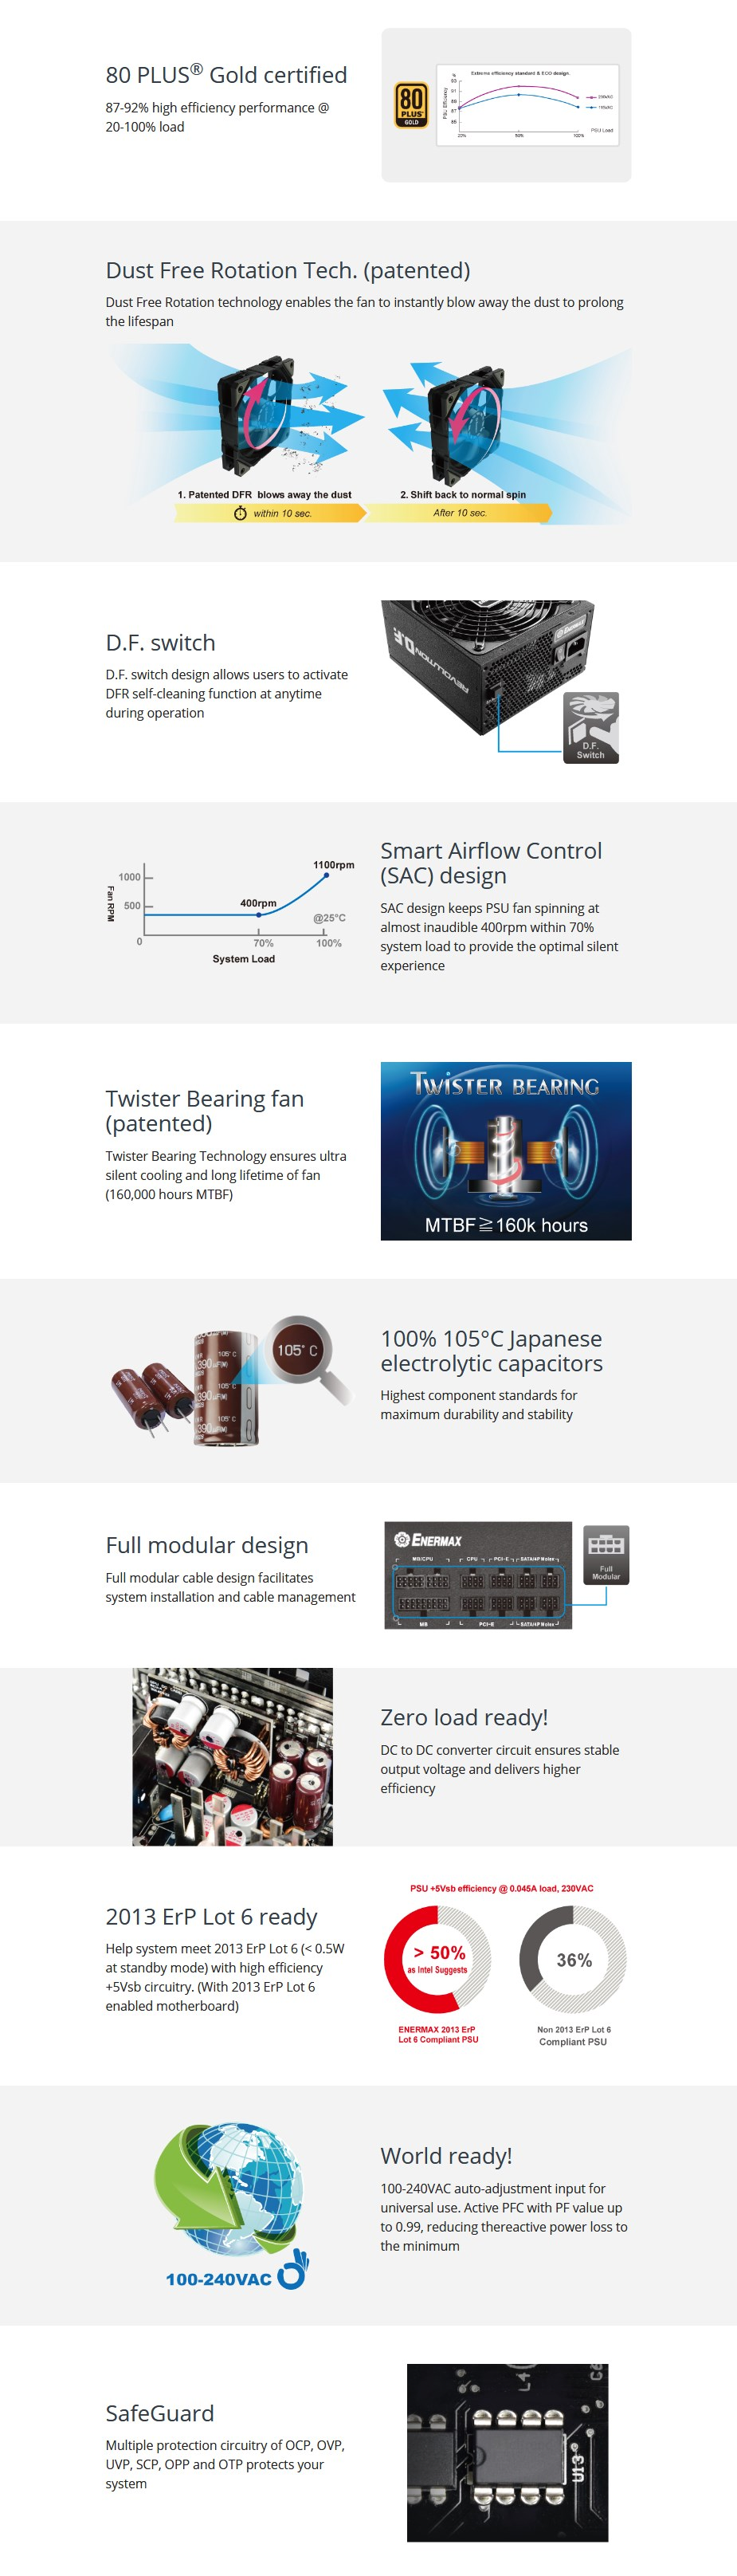 Enermax REVOLUTION D.F Series 750W 80+ Gold Fully Modular Design - Overview 2